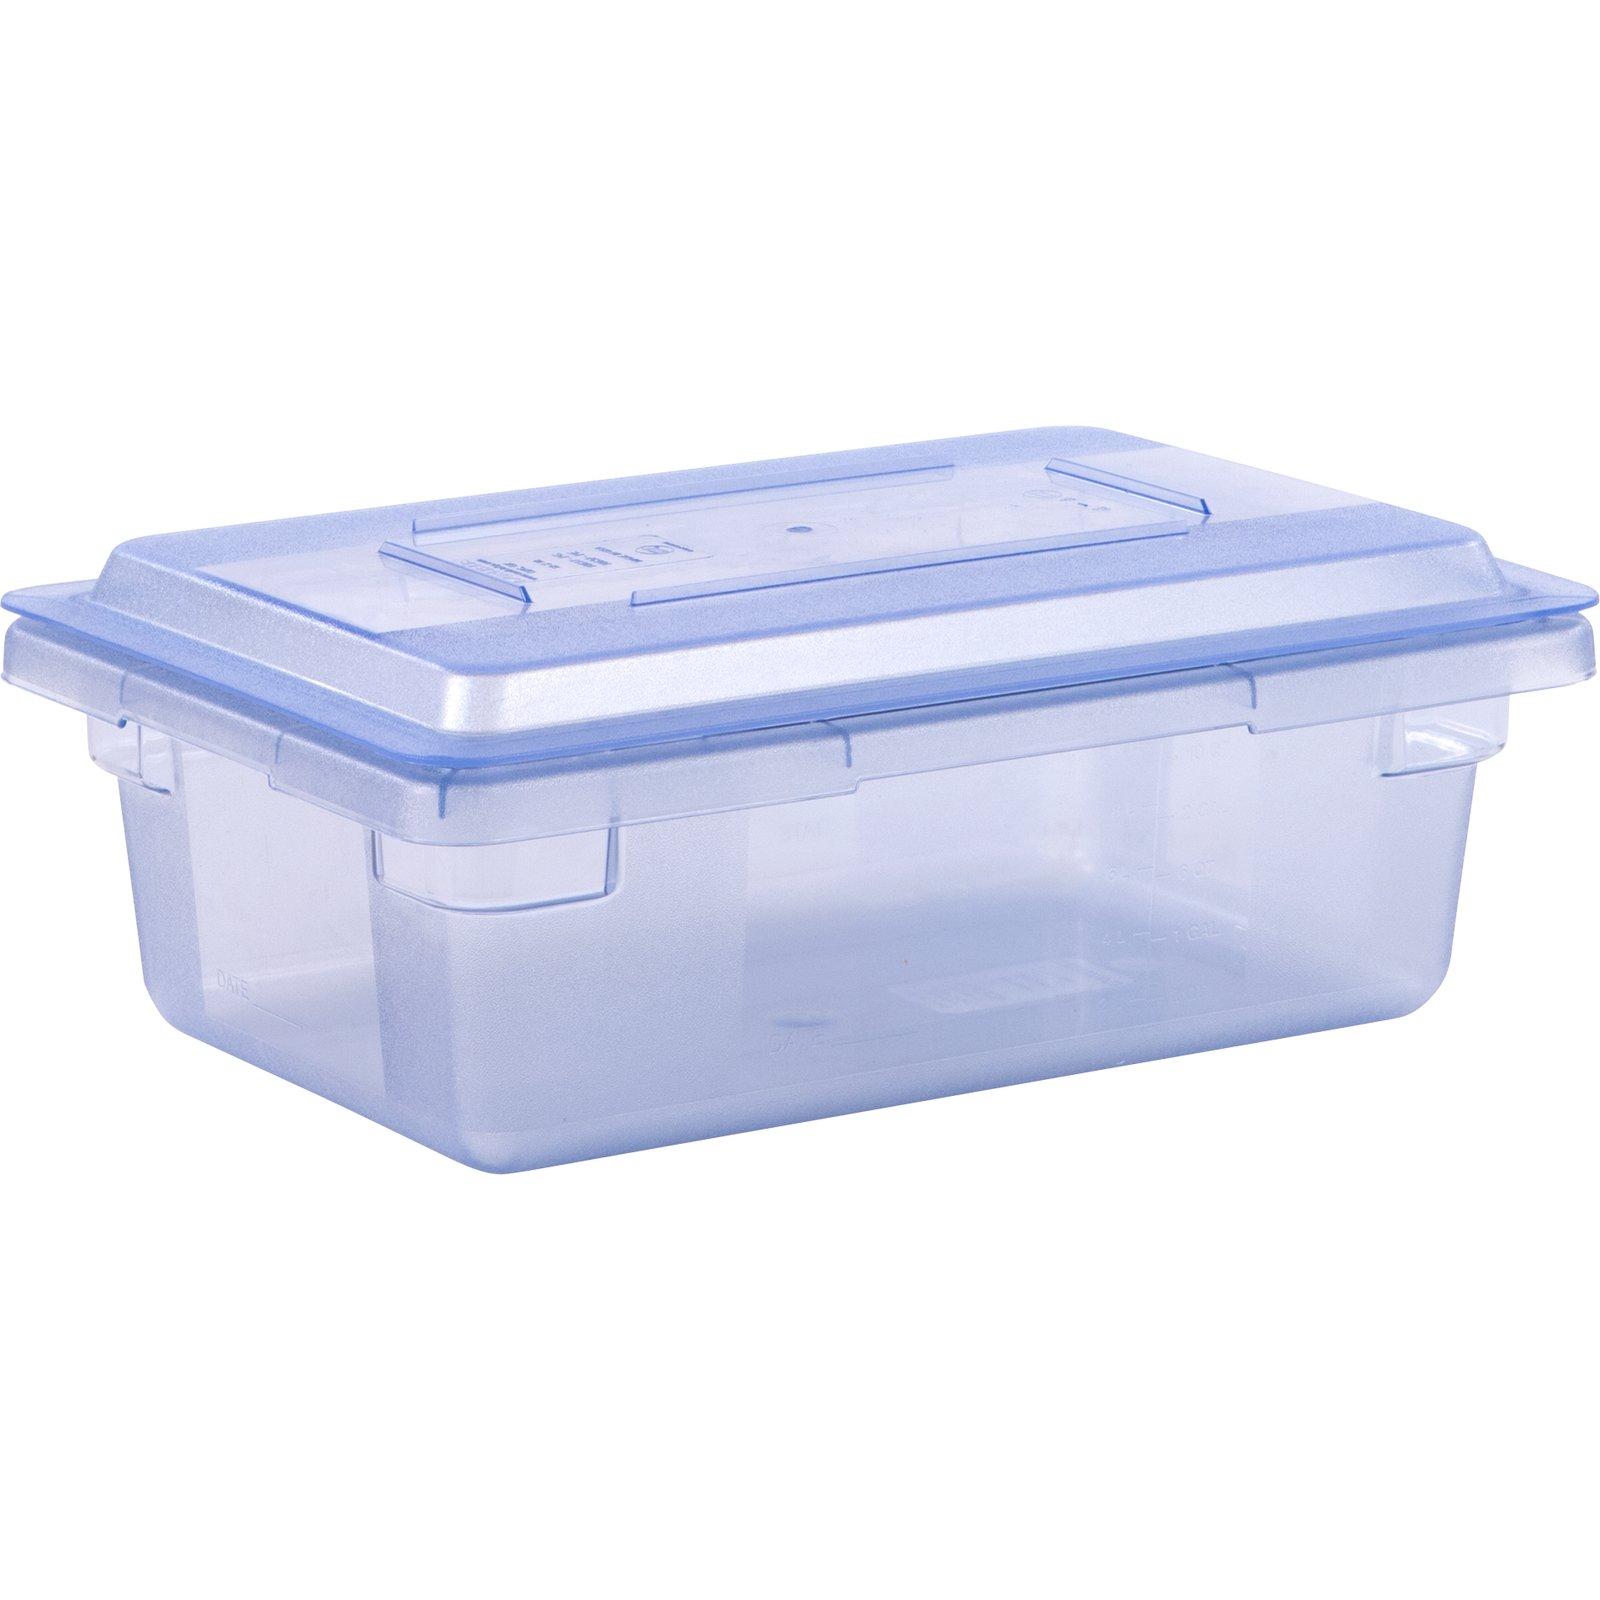 10617c14 storplus color coded food box storage. Black Bedroom Furniture Sets. Home Design Ideas